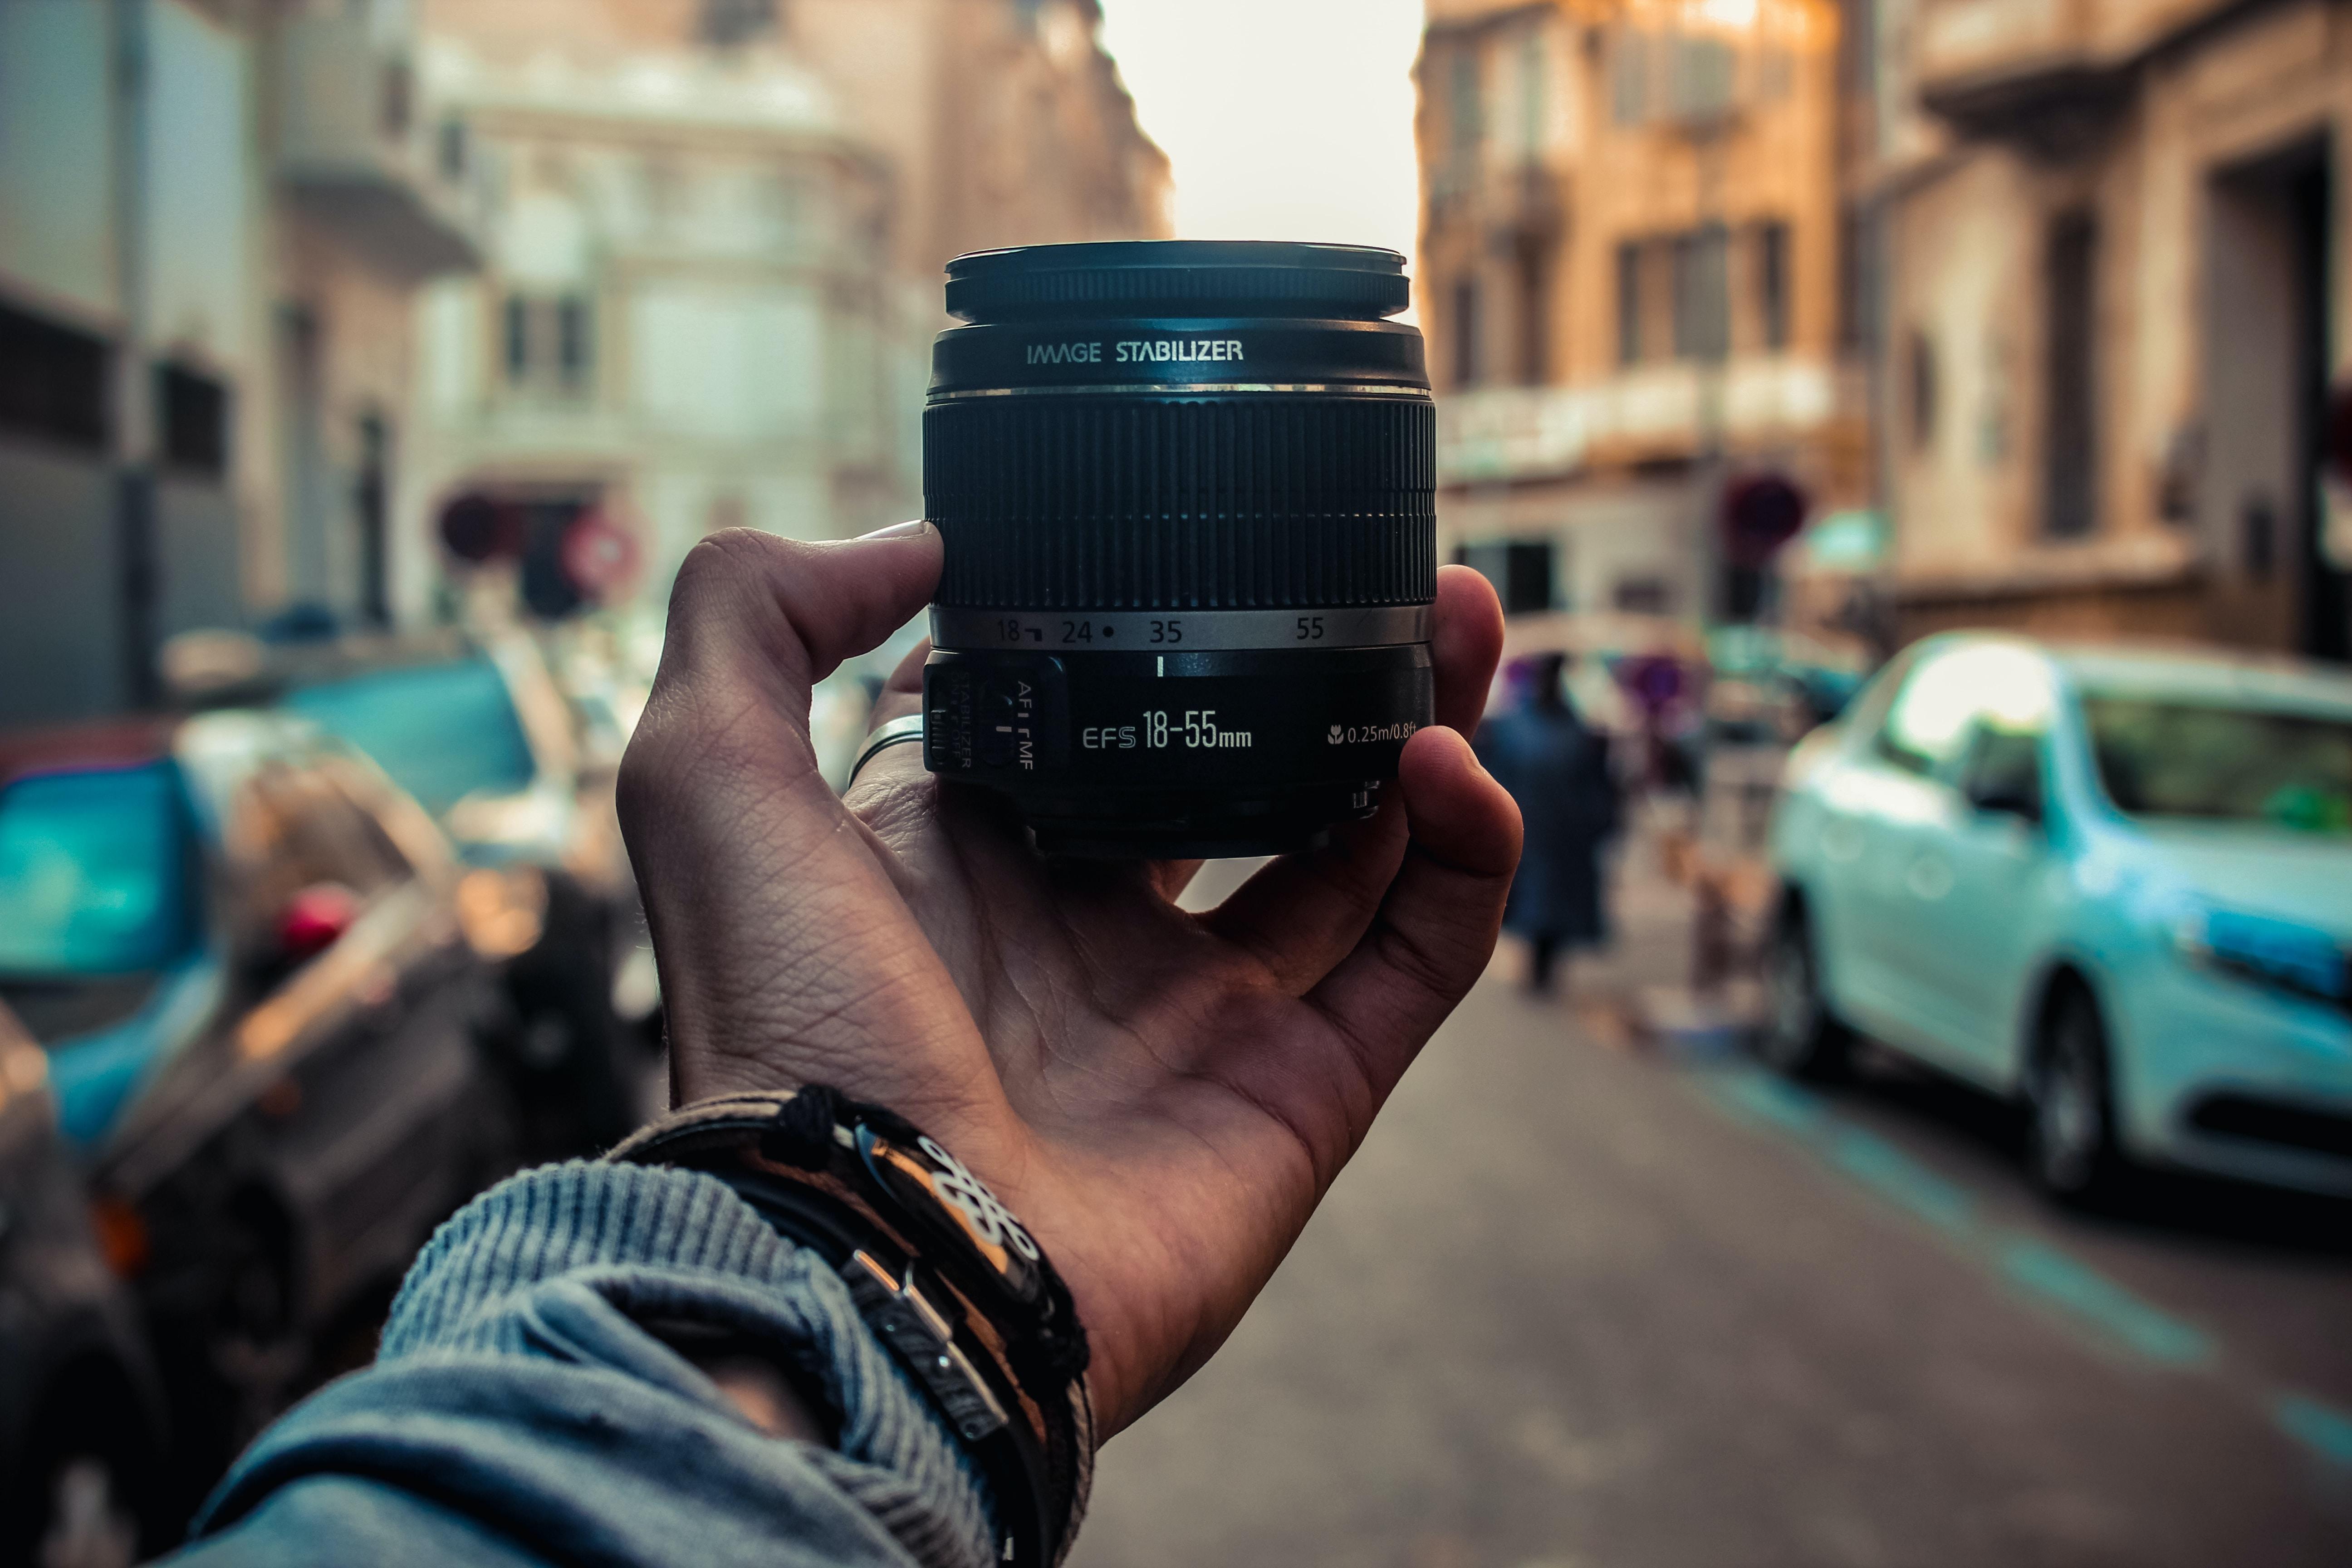 black and blue DSLR camera